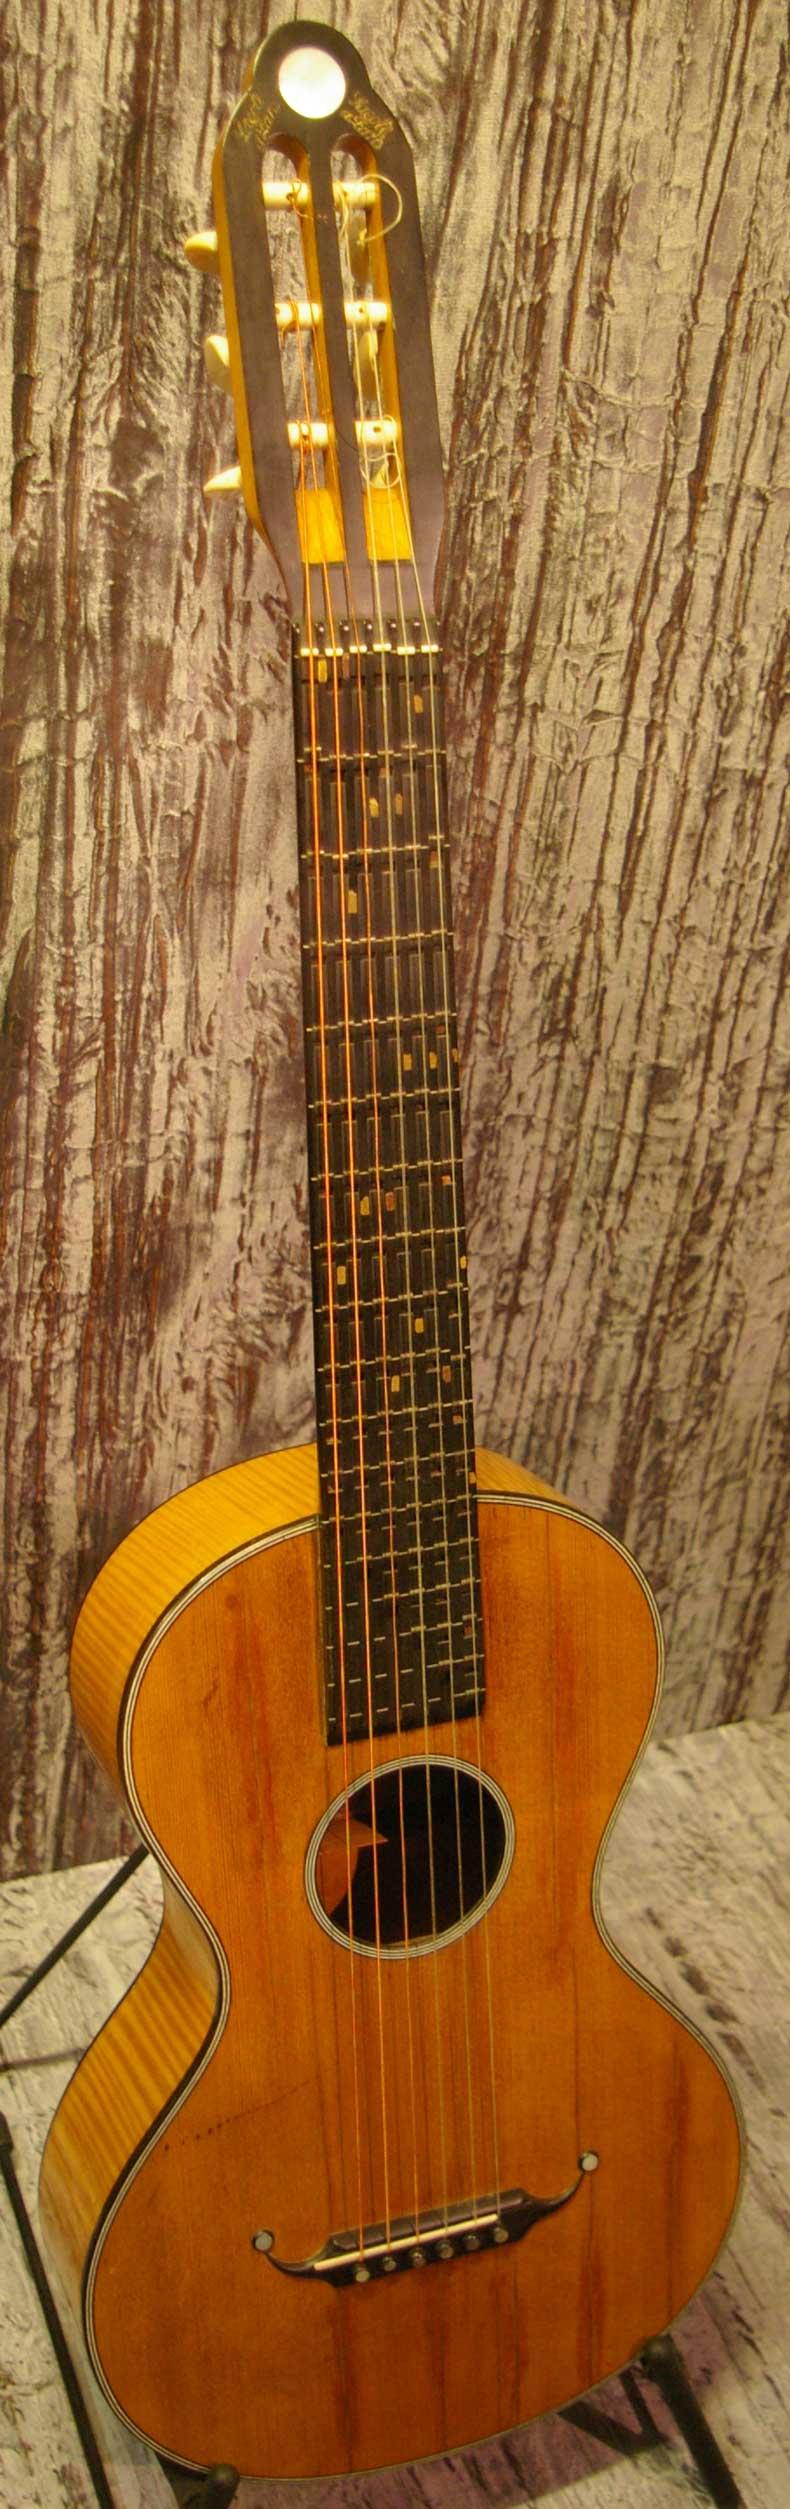 Classical Guitar Making Wikipedia